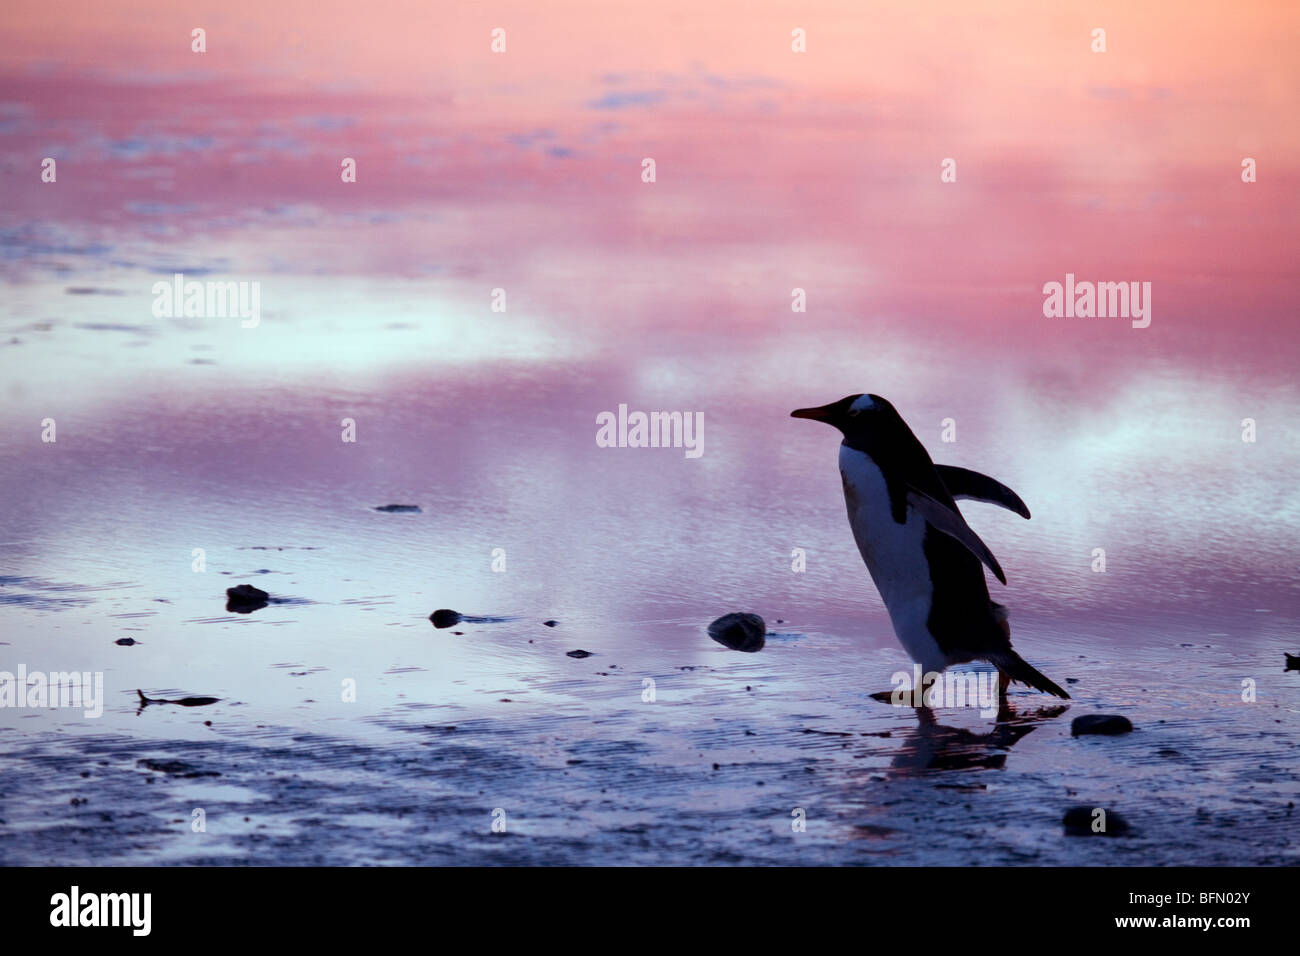 Falkland Islands. Gentoo penguns (Pygoscelis papua) on 'penguin highway' between sea and rookery at Bluff - Stock Image